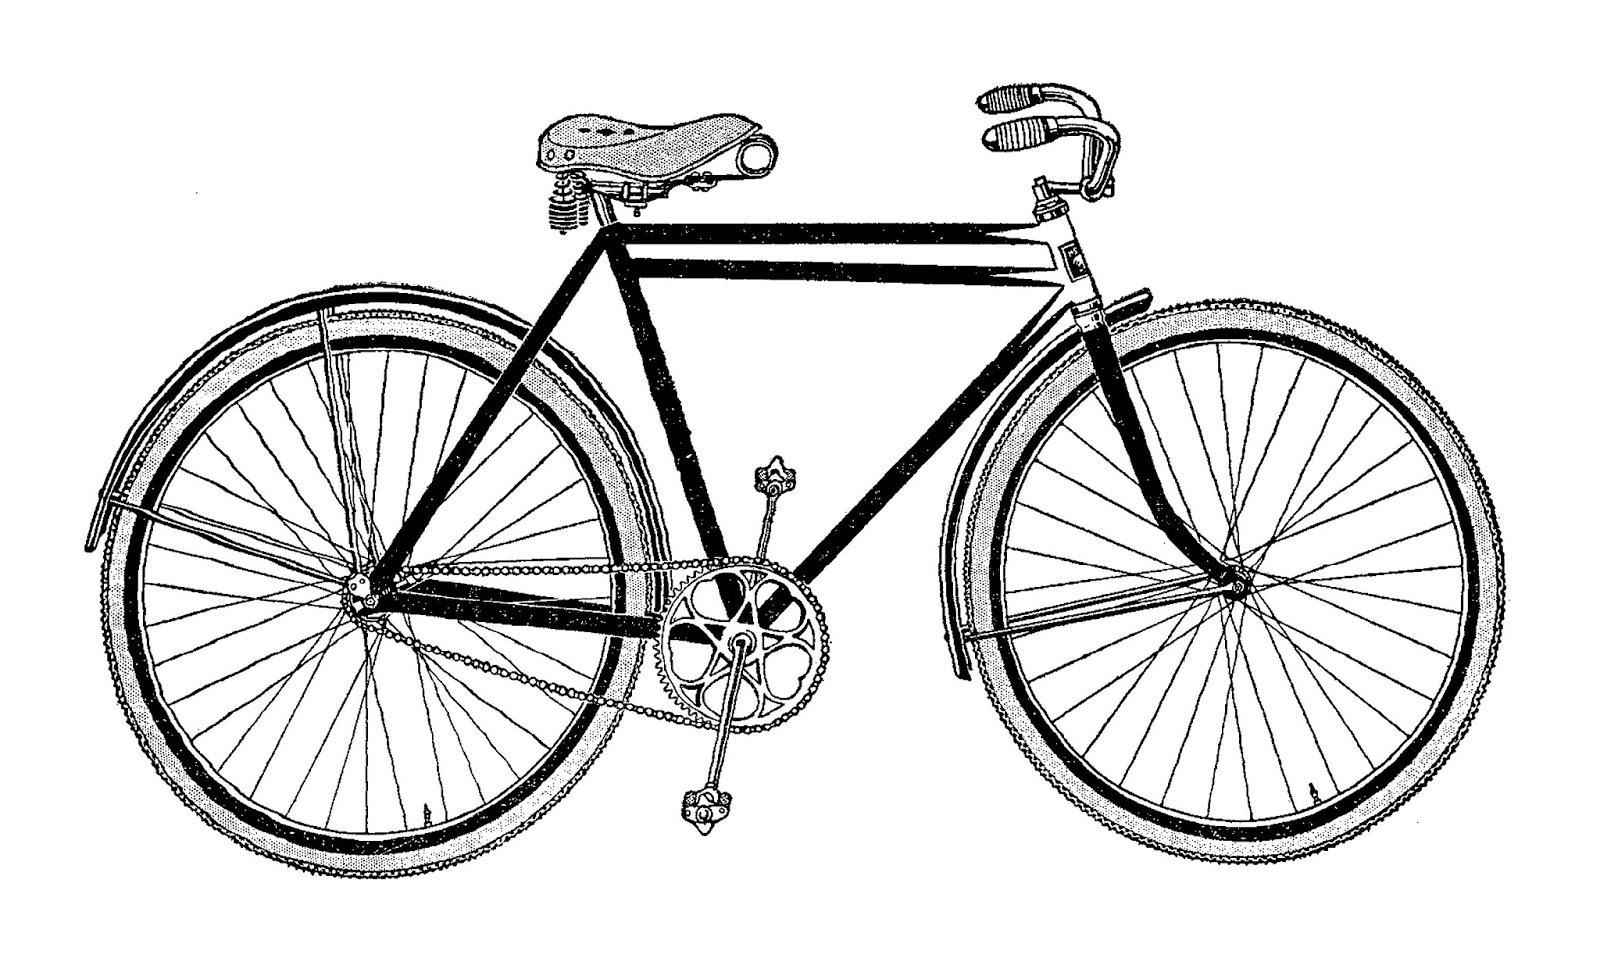 Digital Stamp Design Vintage Bicycle Artwork